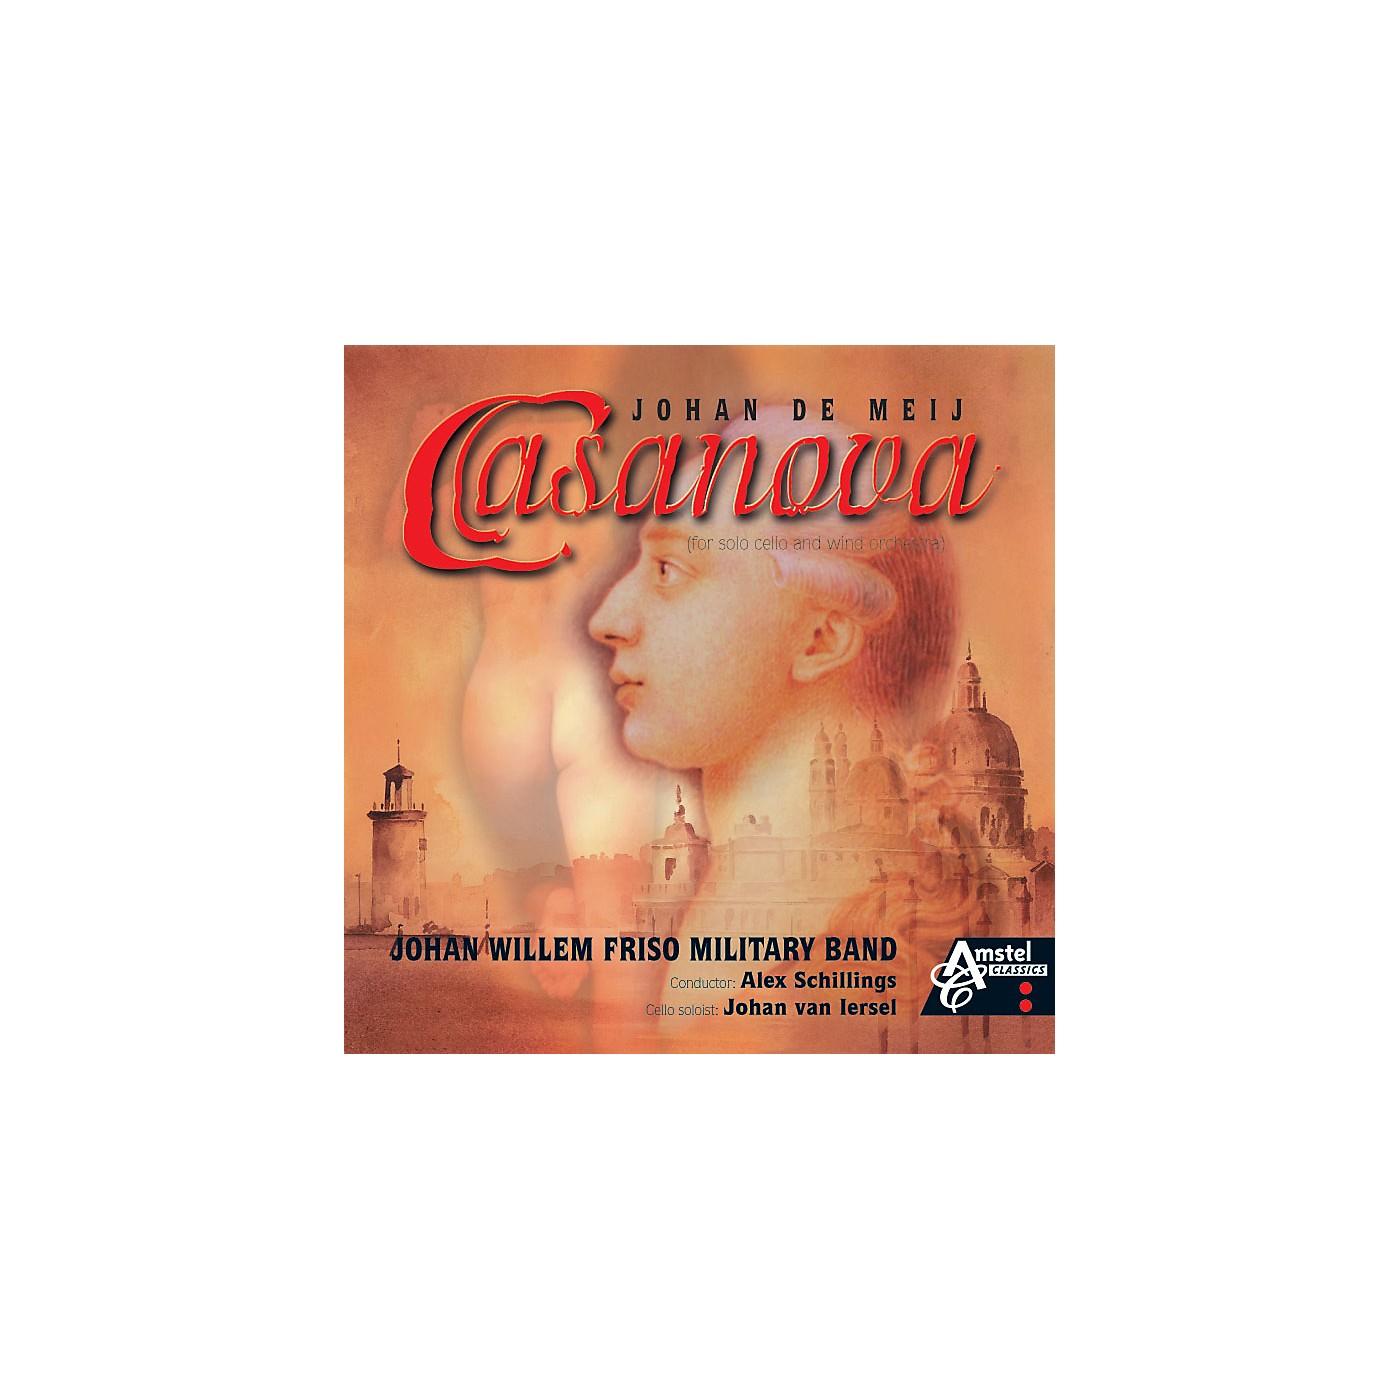 Amstel Music Casanova (Amstel Classics CD) Concert Band Level 4-5 Composed by Johan de Meij thumbnail